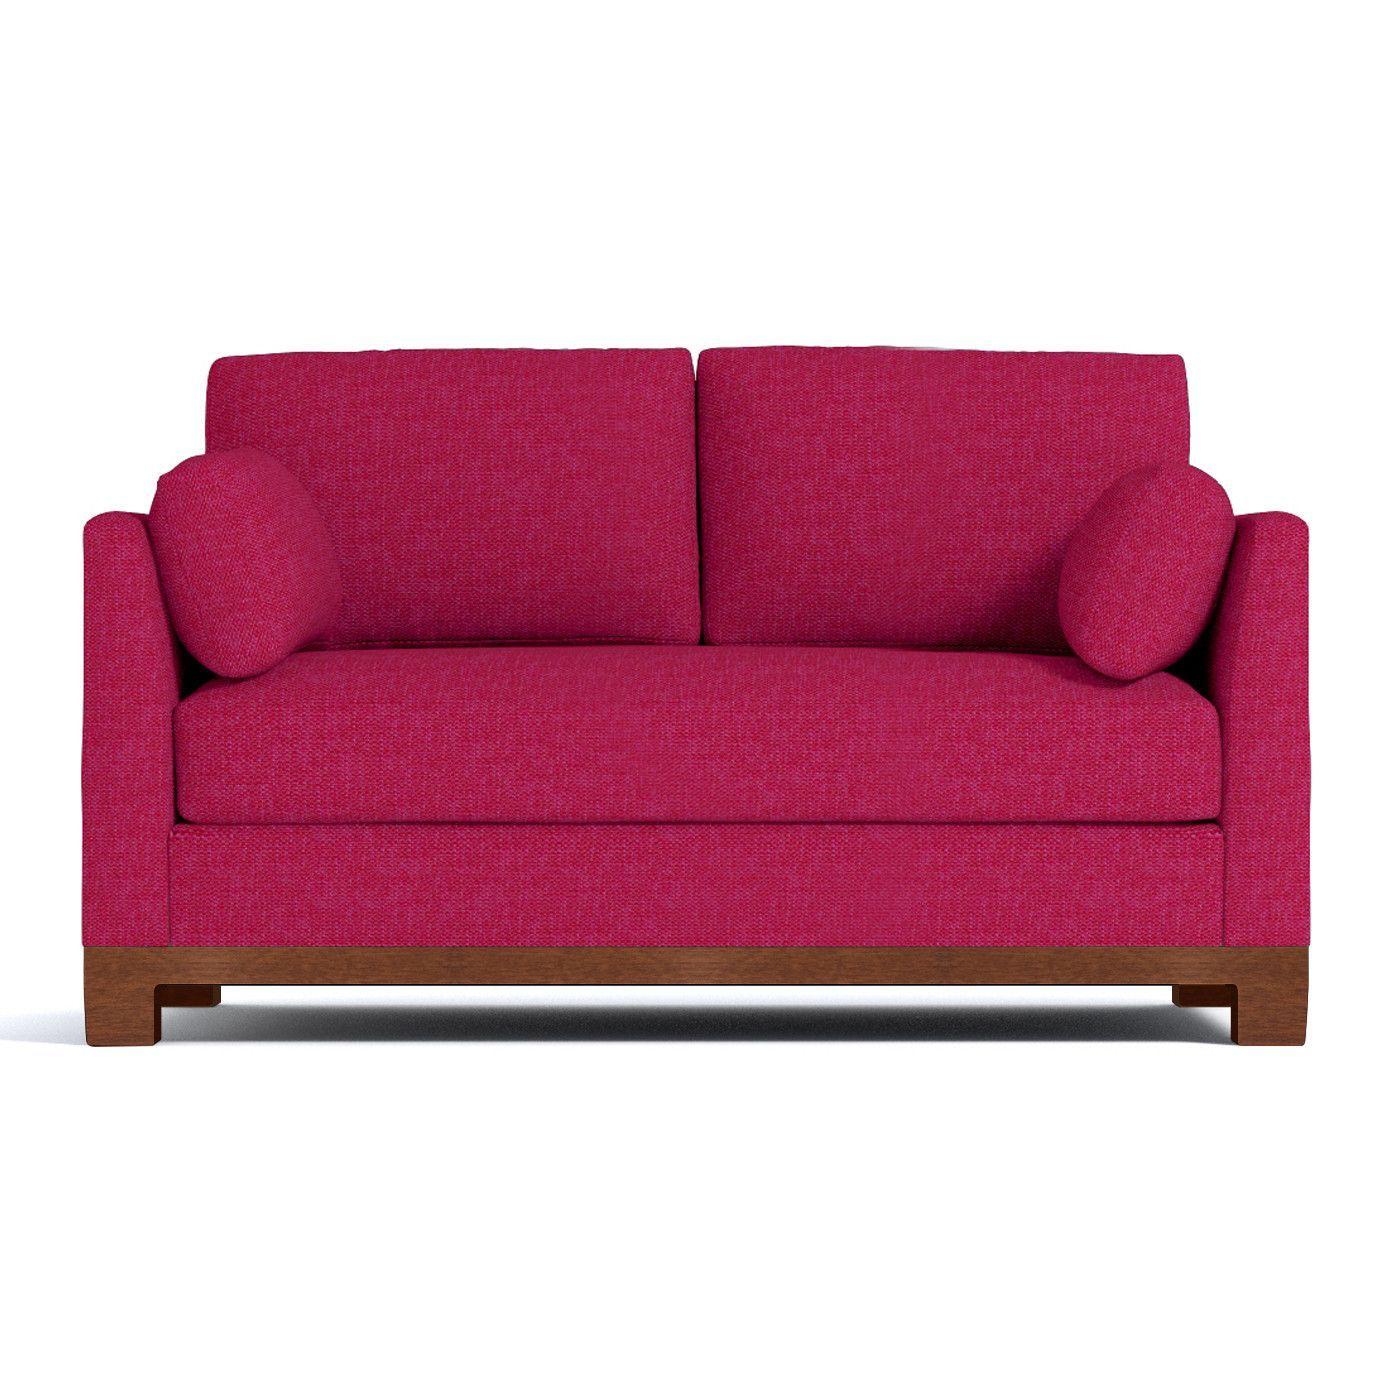 Avalon Apartment Size Sleeper Sofa CHOICE OF FABRICS | Products ...